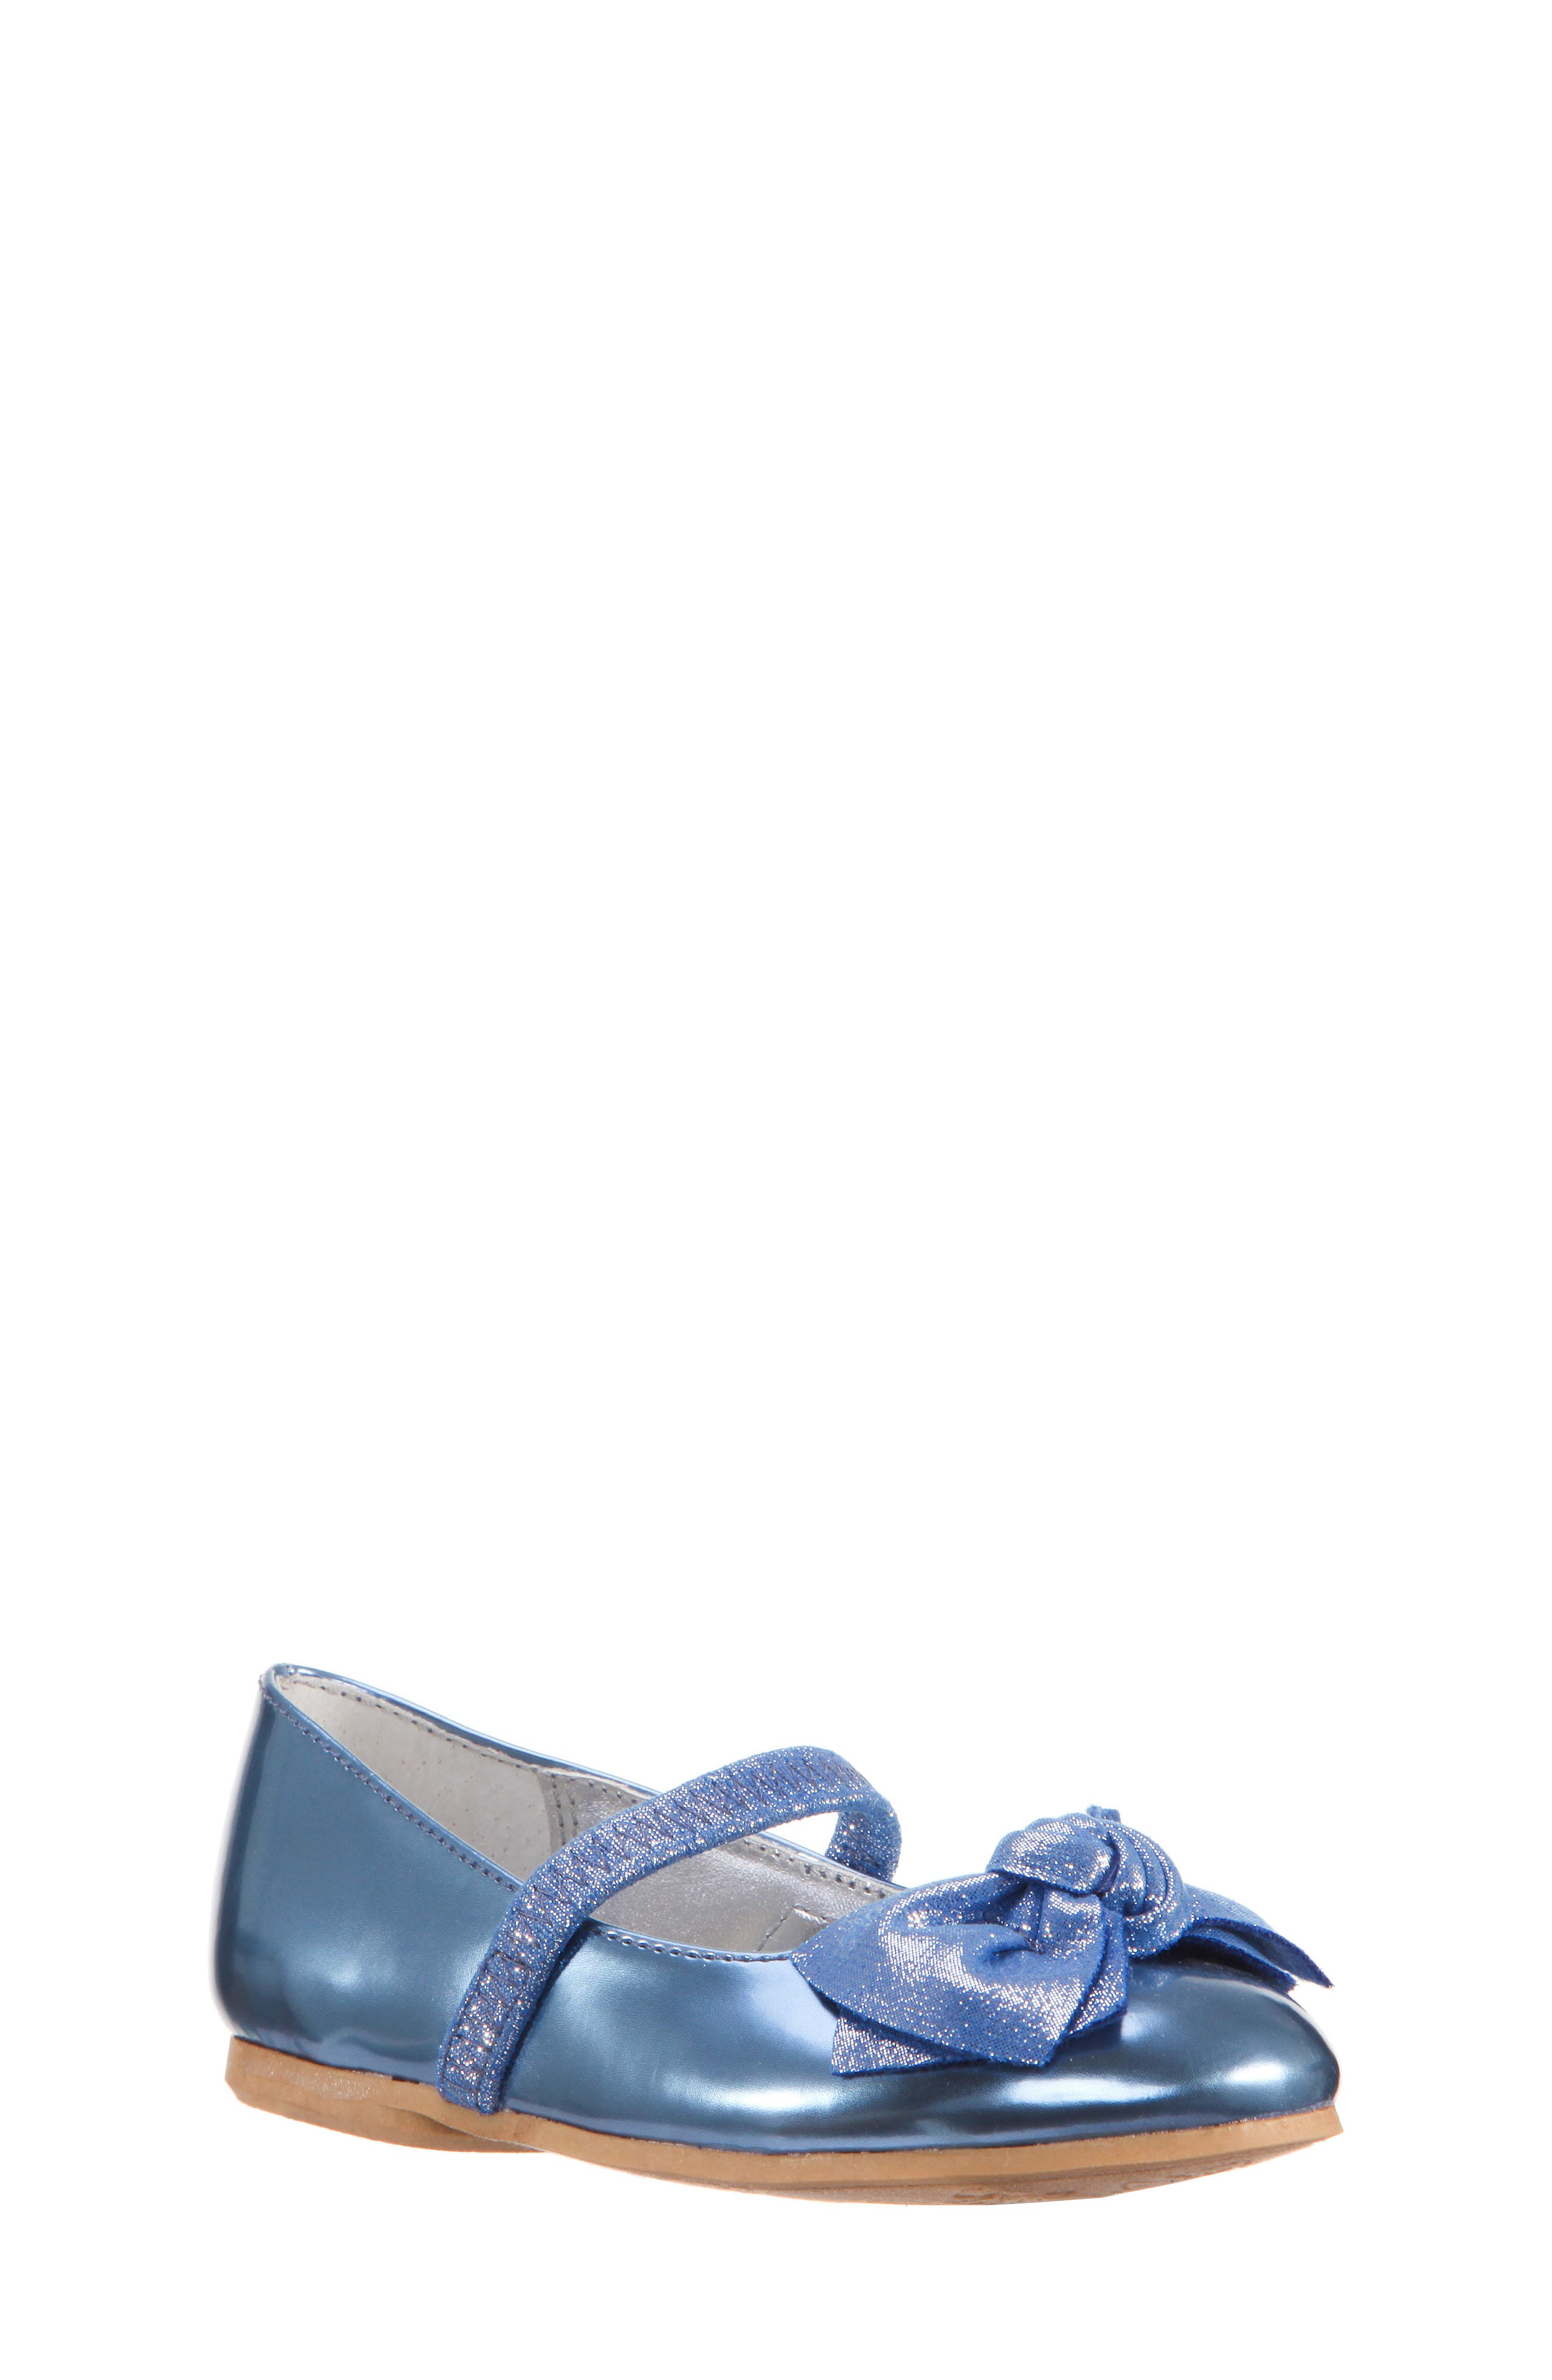 Kaytelyn-T Glitter Bow Ballet Flat,                         Main,                         color, Blue Mirror Metallic